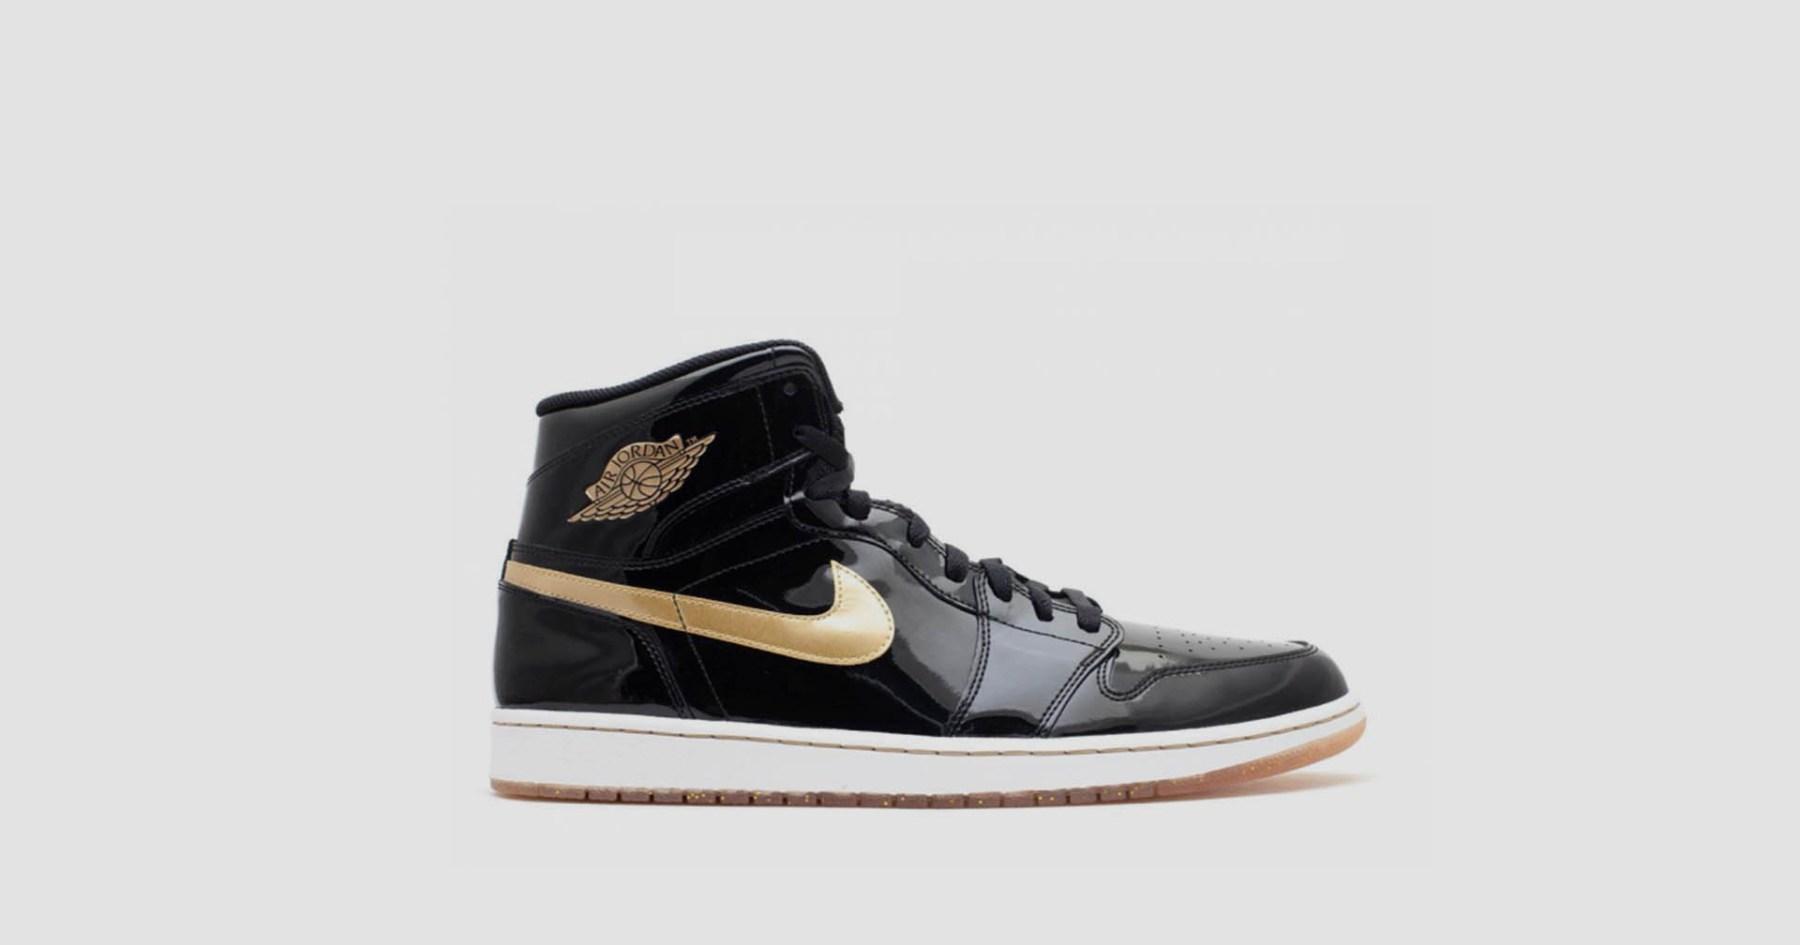 Belfort Meets Jordan on Wall Street-Esque Sneaker Site